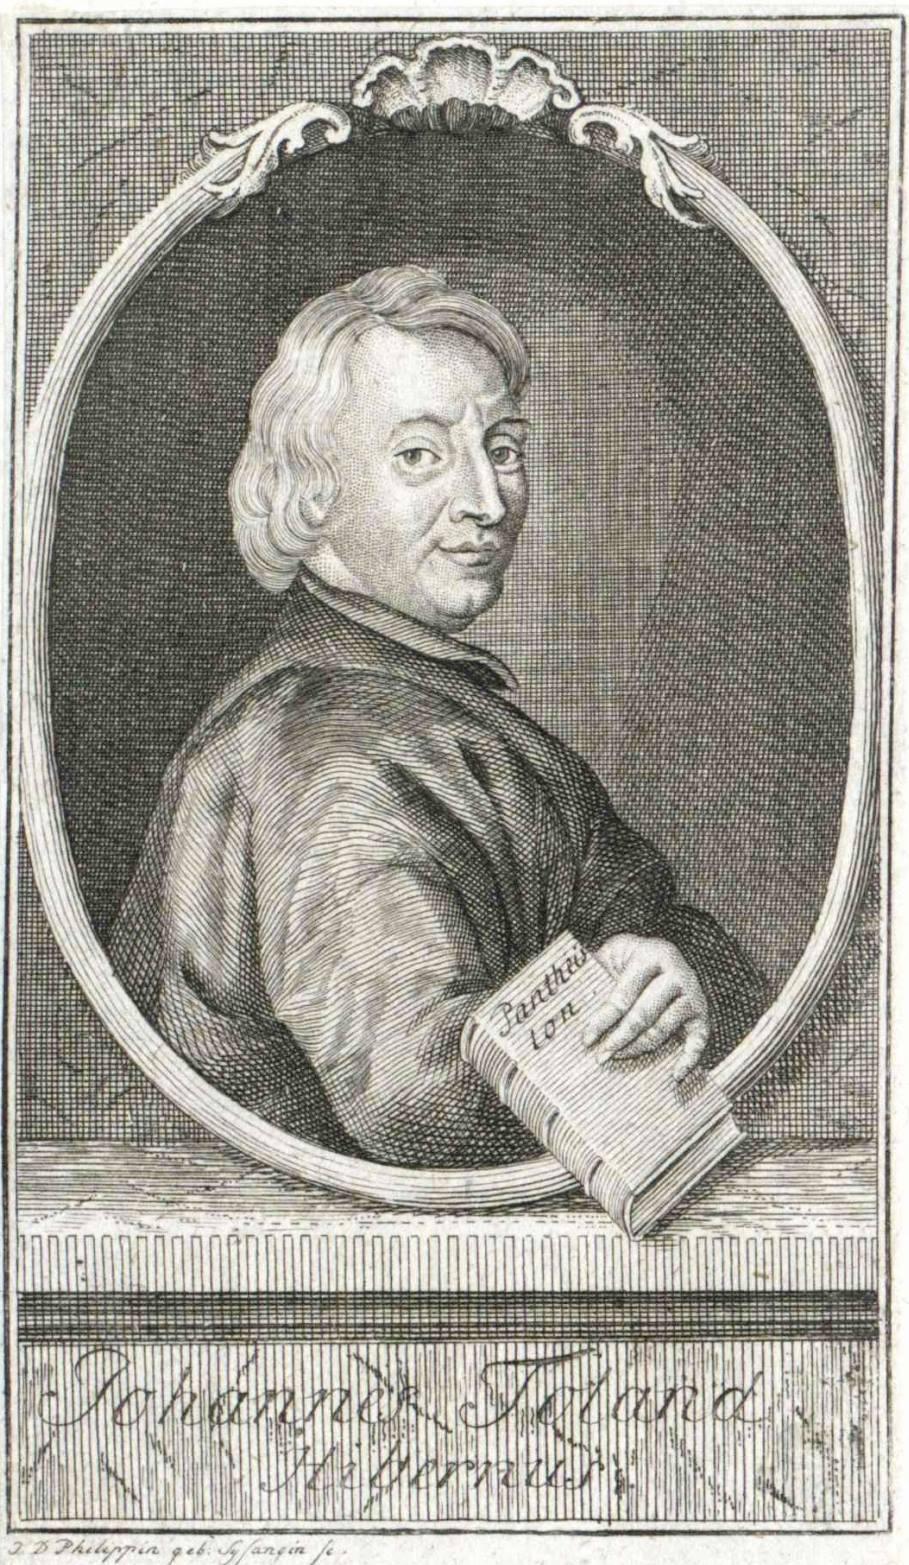 John Toland